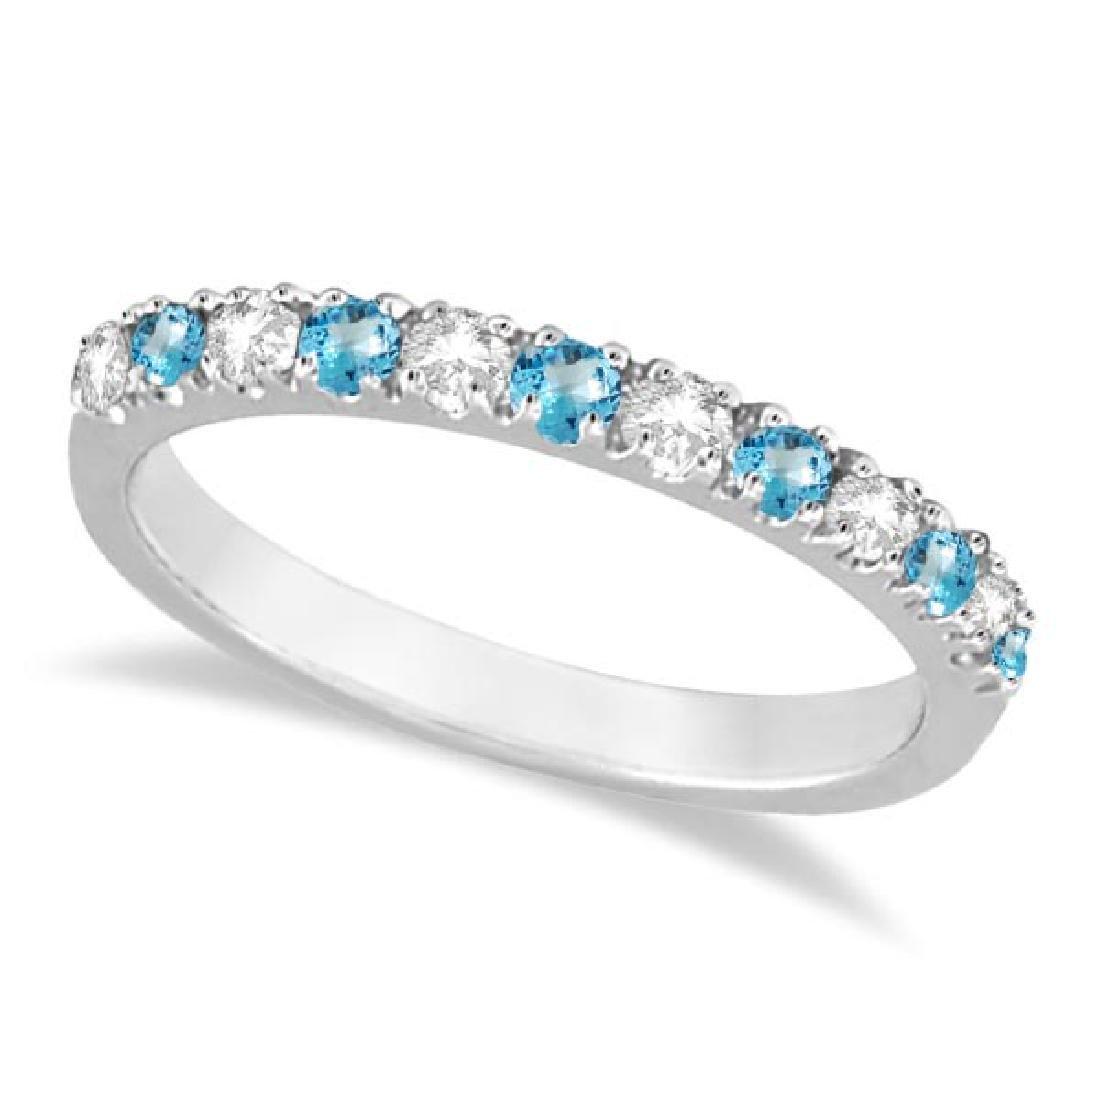 Diamond and Blue Topaz Ring Anniversary Band 14k White